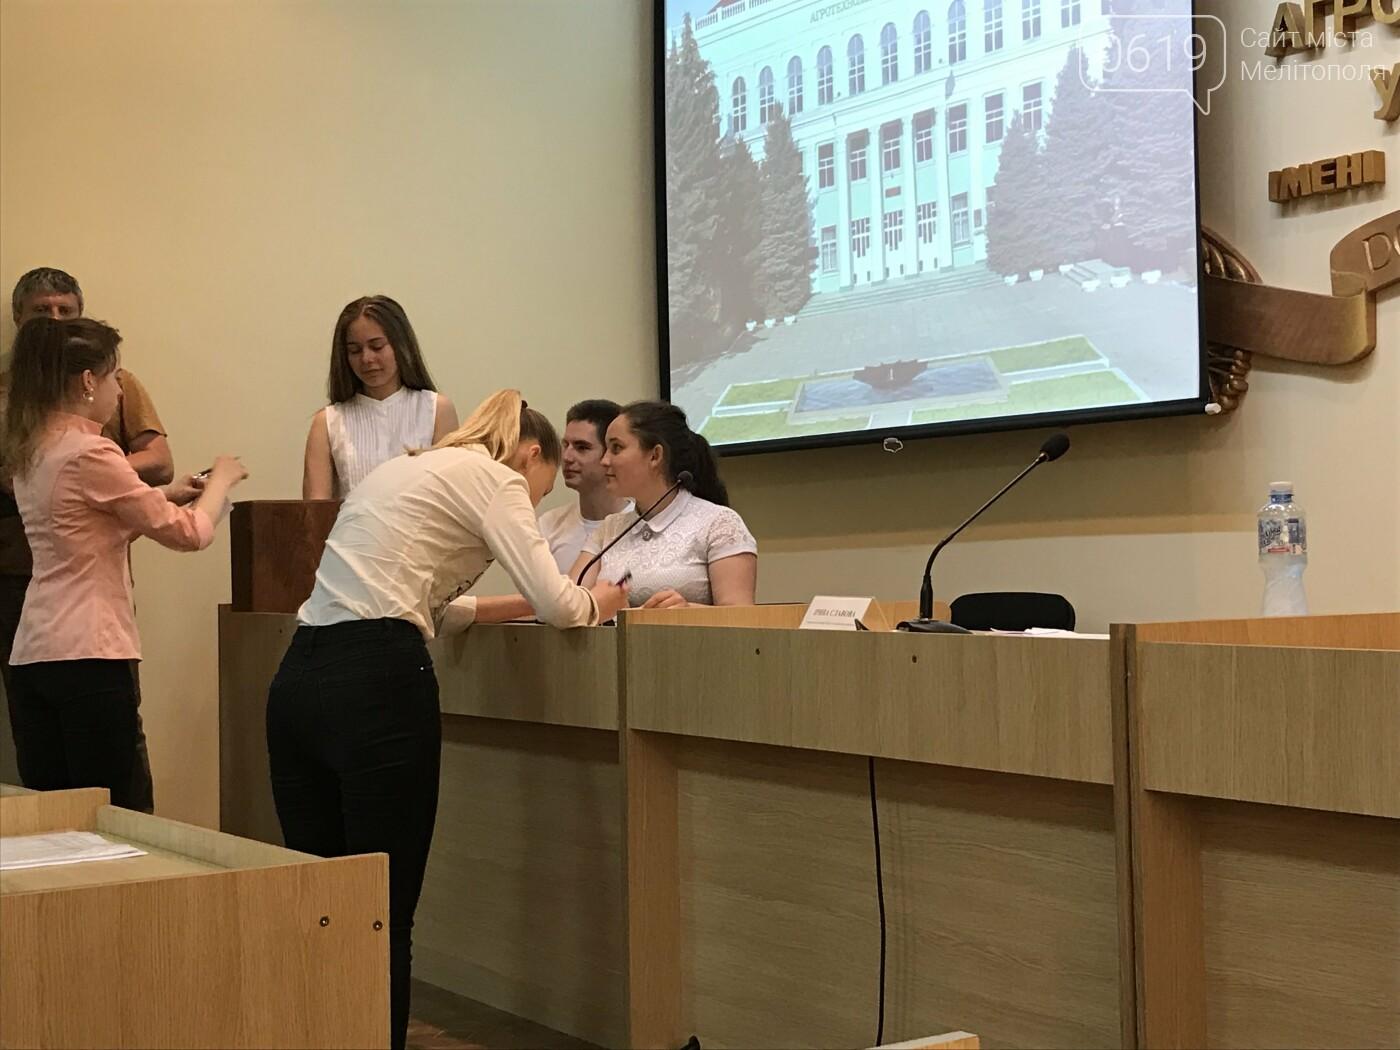 В Мелитополе прошла первая сессия Молодежного парламента , фото-7